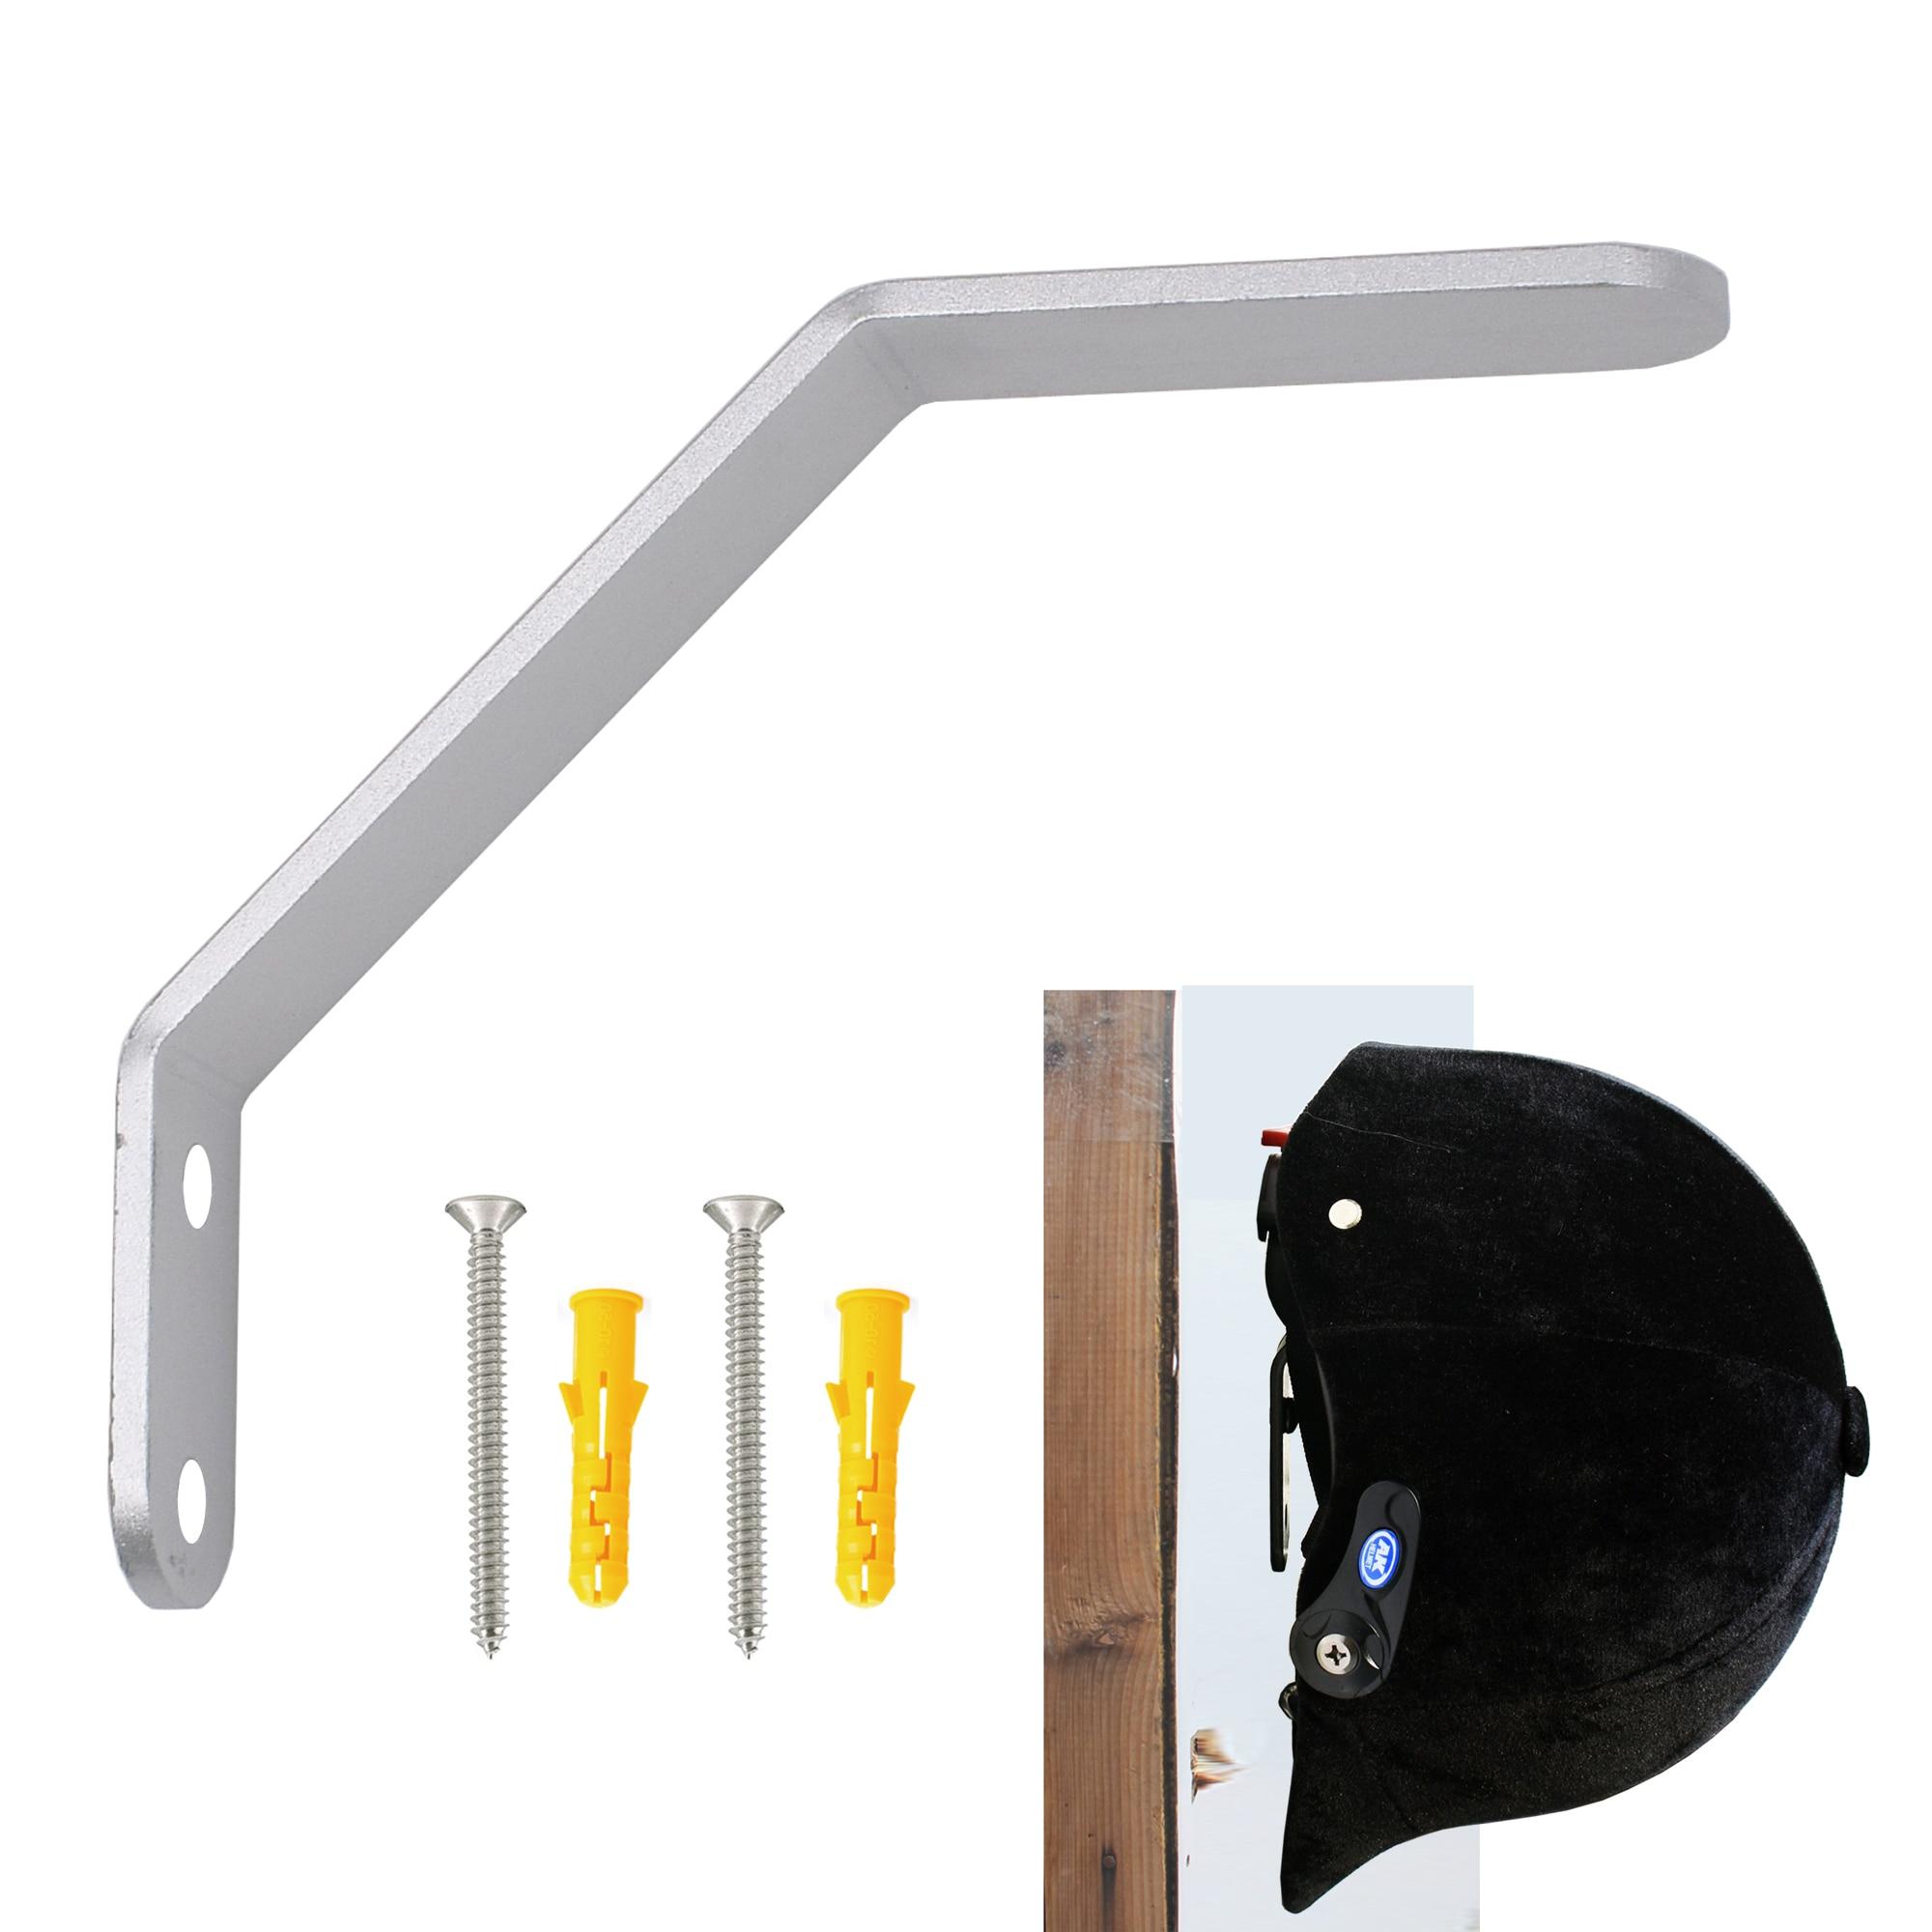 Wall Mounted Equestrian Helmet Rack Holder Hanger - No Helmet